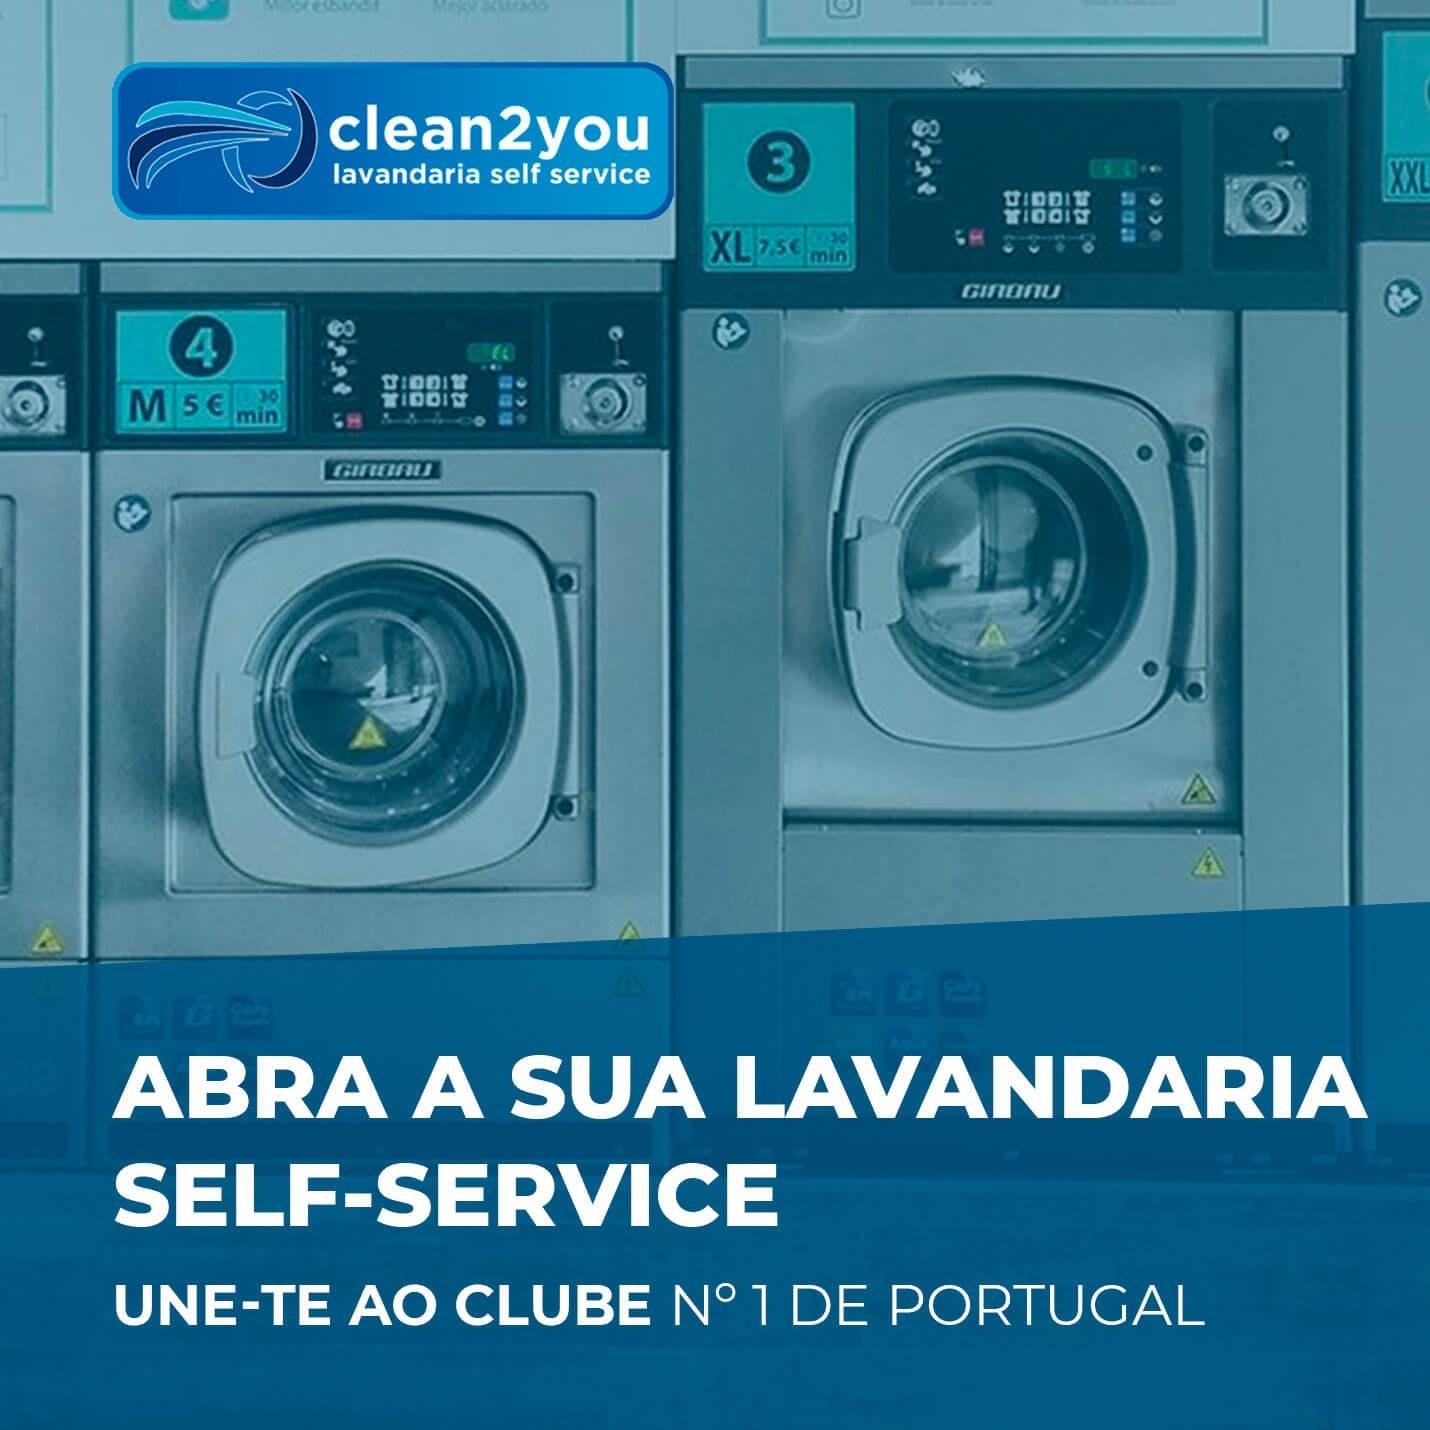 Abra a sua lavandaria self-sevice